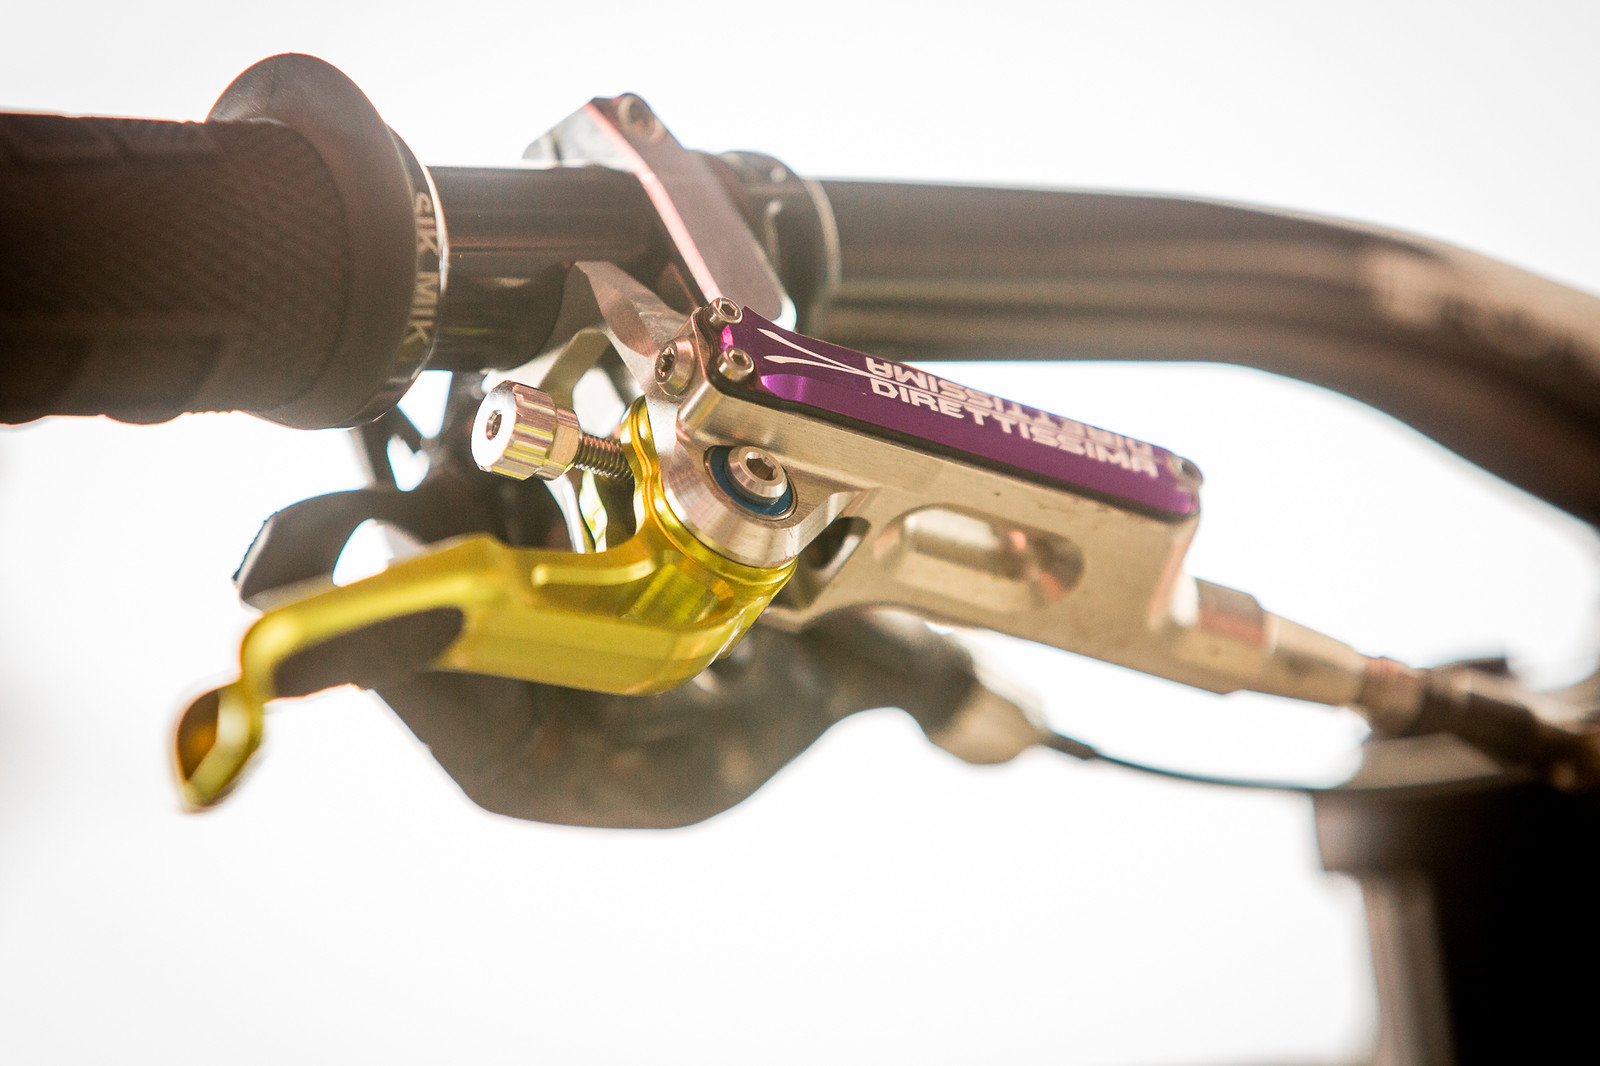 Trickstuff's New Maxima Brake - PIT BITS - Andorra World Cup Downhill - Mountain Biking Pictures - Vital MTB